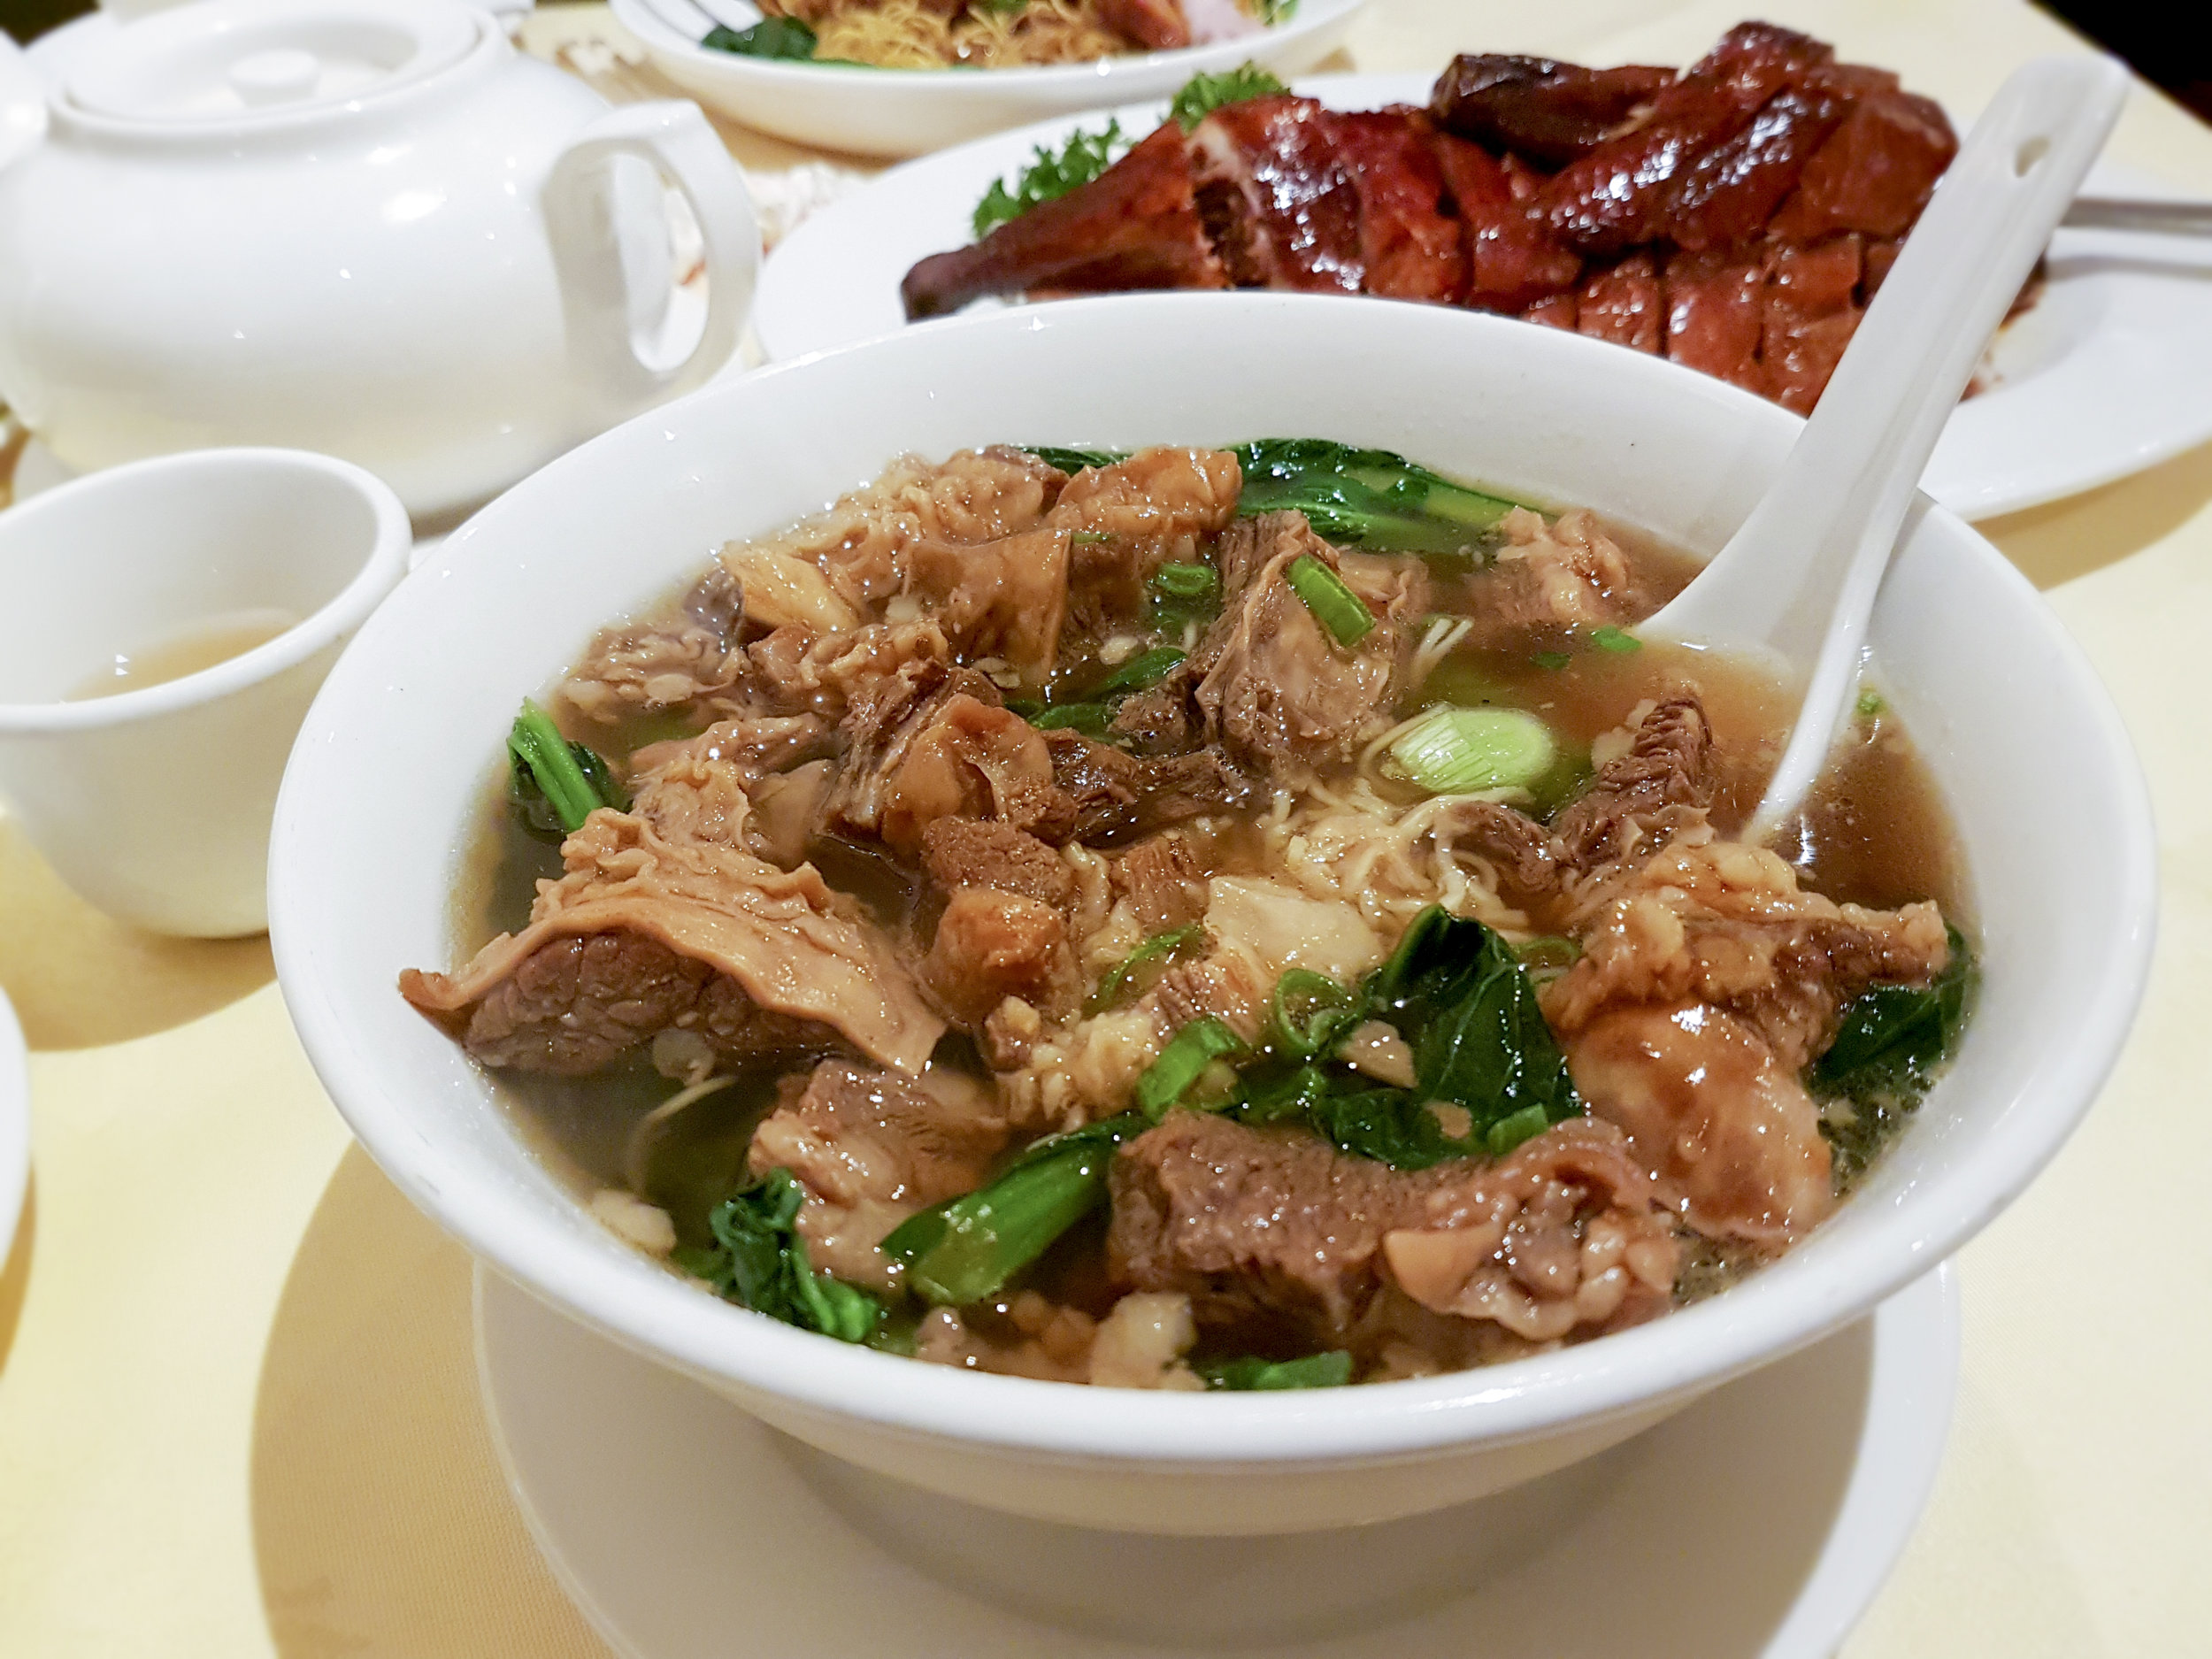 beef brisket noodle soup from Joy King Lau, Chinatown